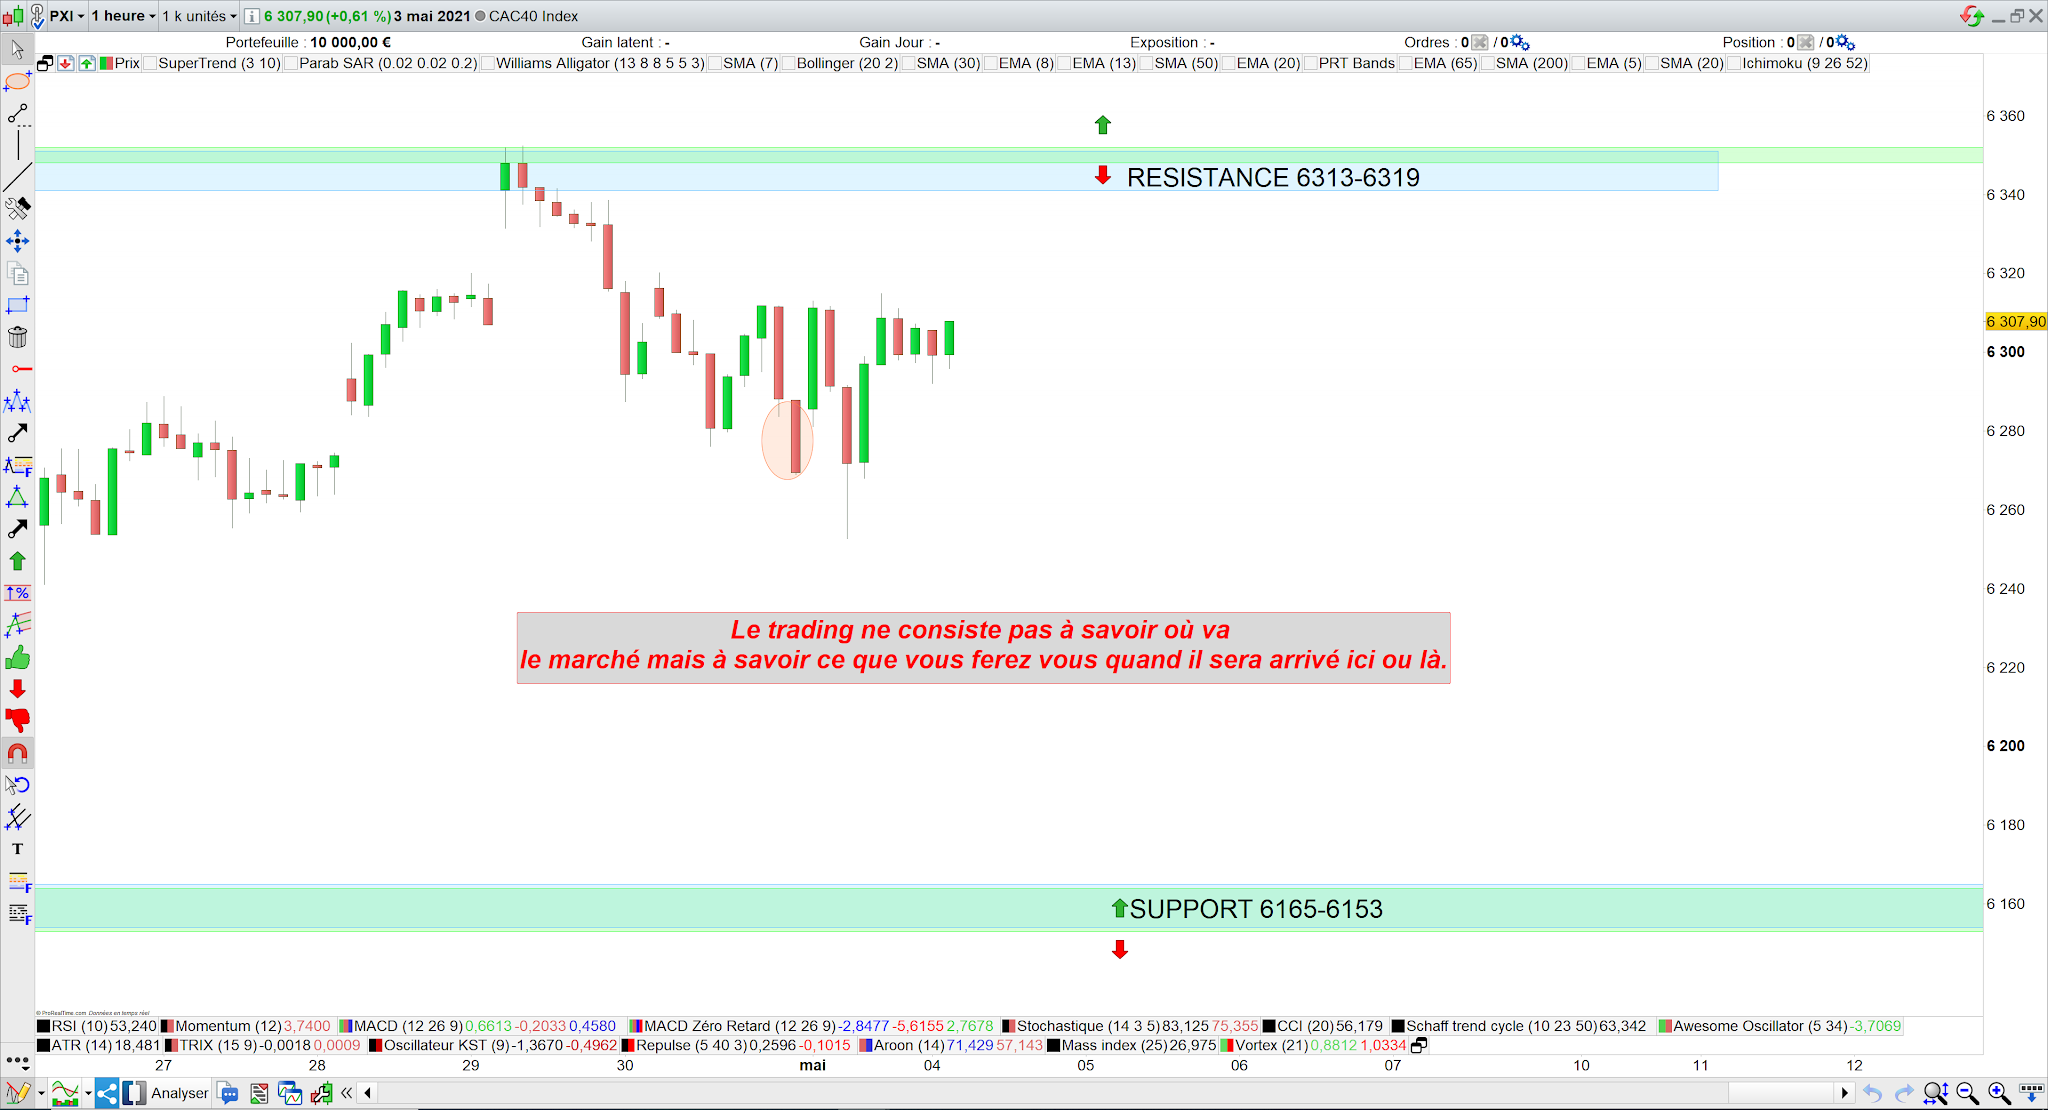 Trading cac40 bilan séance 03 mai 21